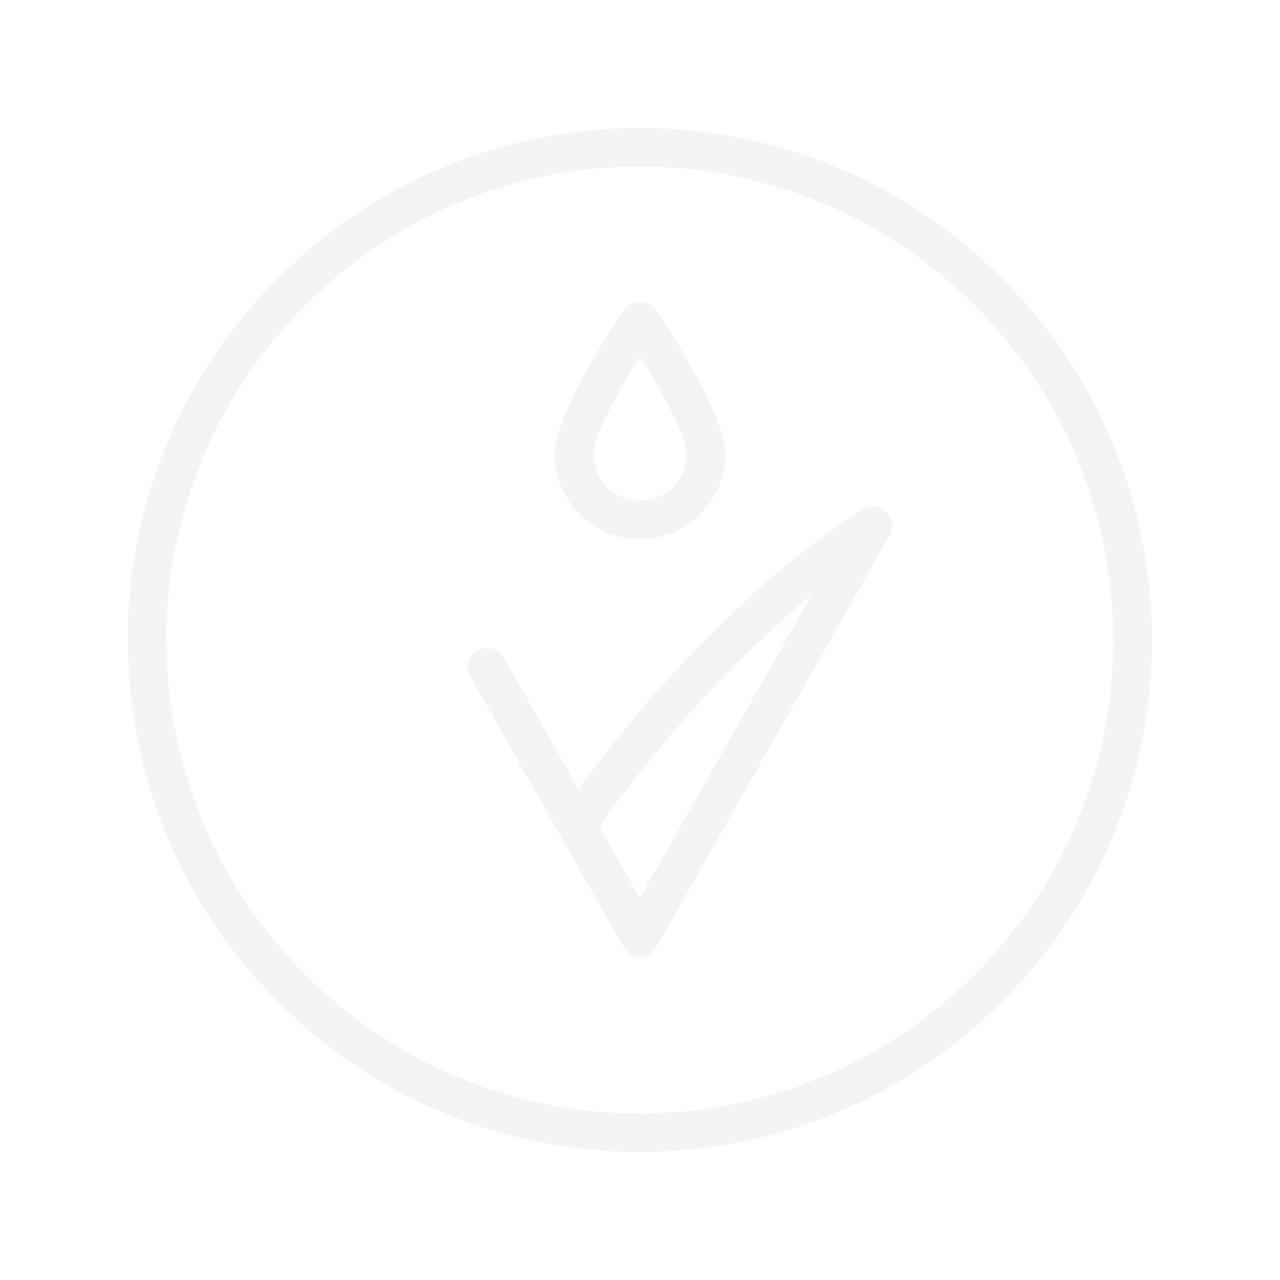 Dior Diorskin Nude Air Powder With Kabuki Brush 10g